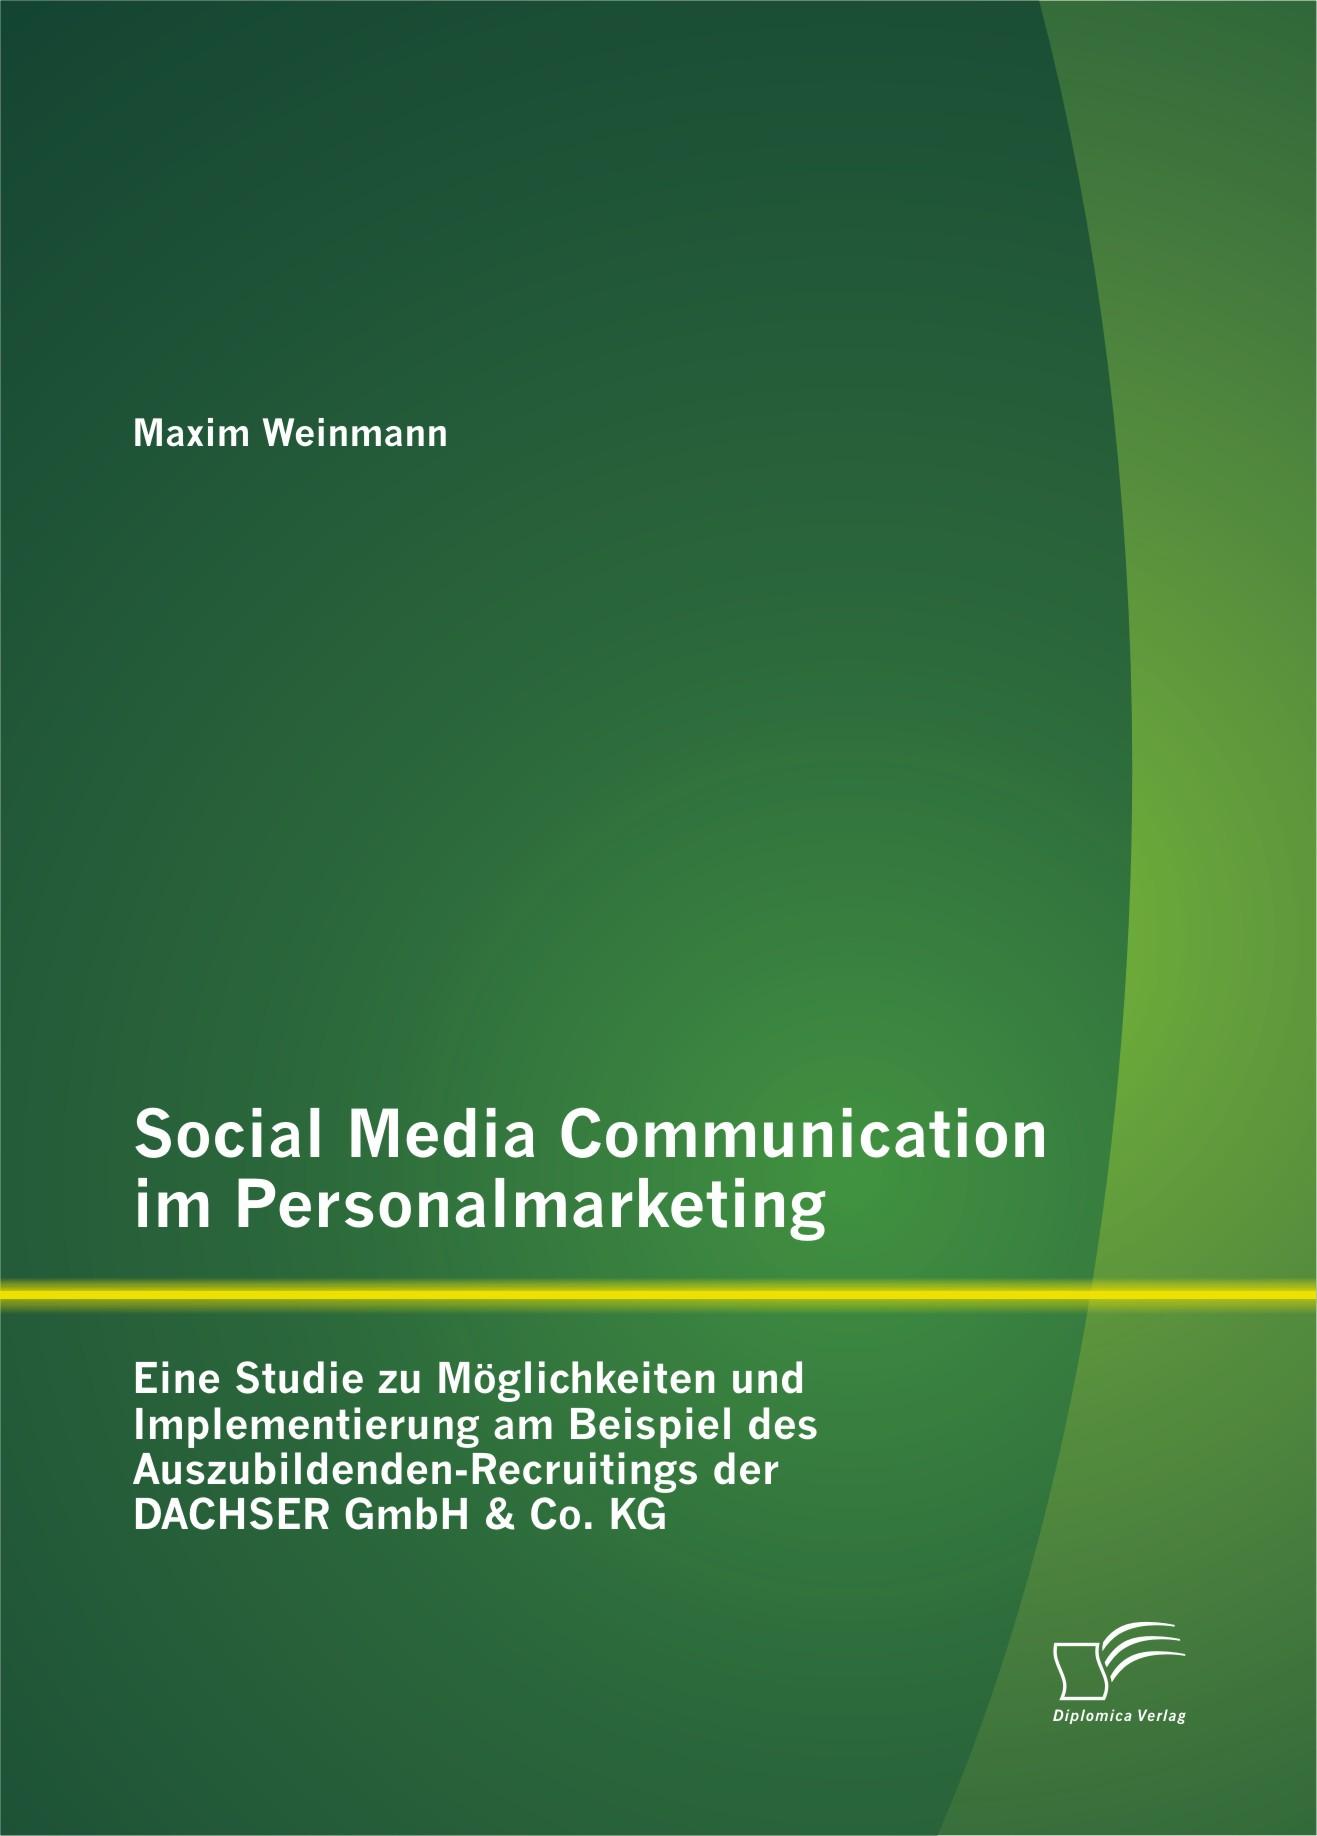 Social Media Communication im Personalmarketing: Eine Studie ... 9783842886056